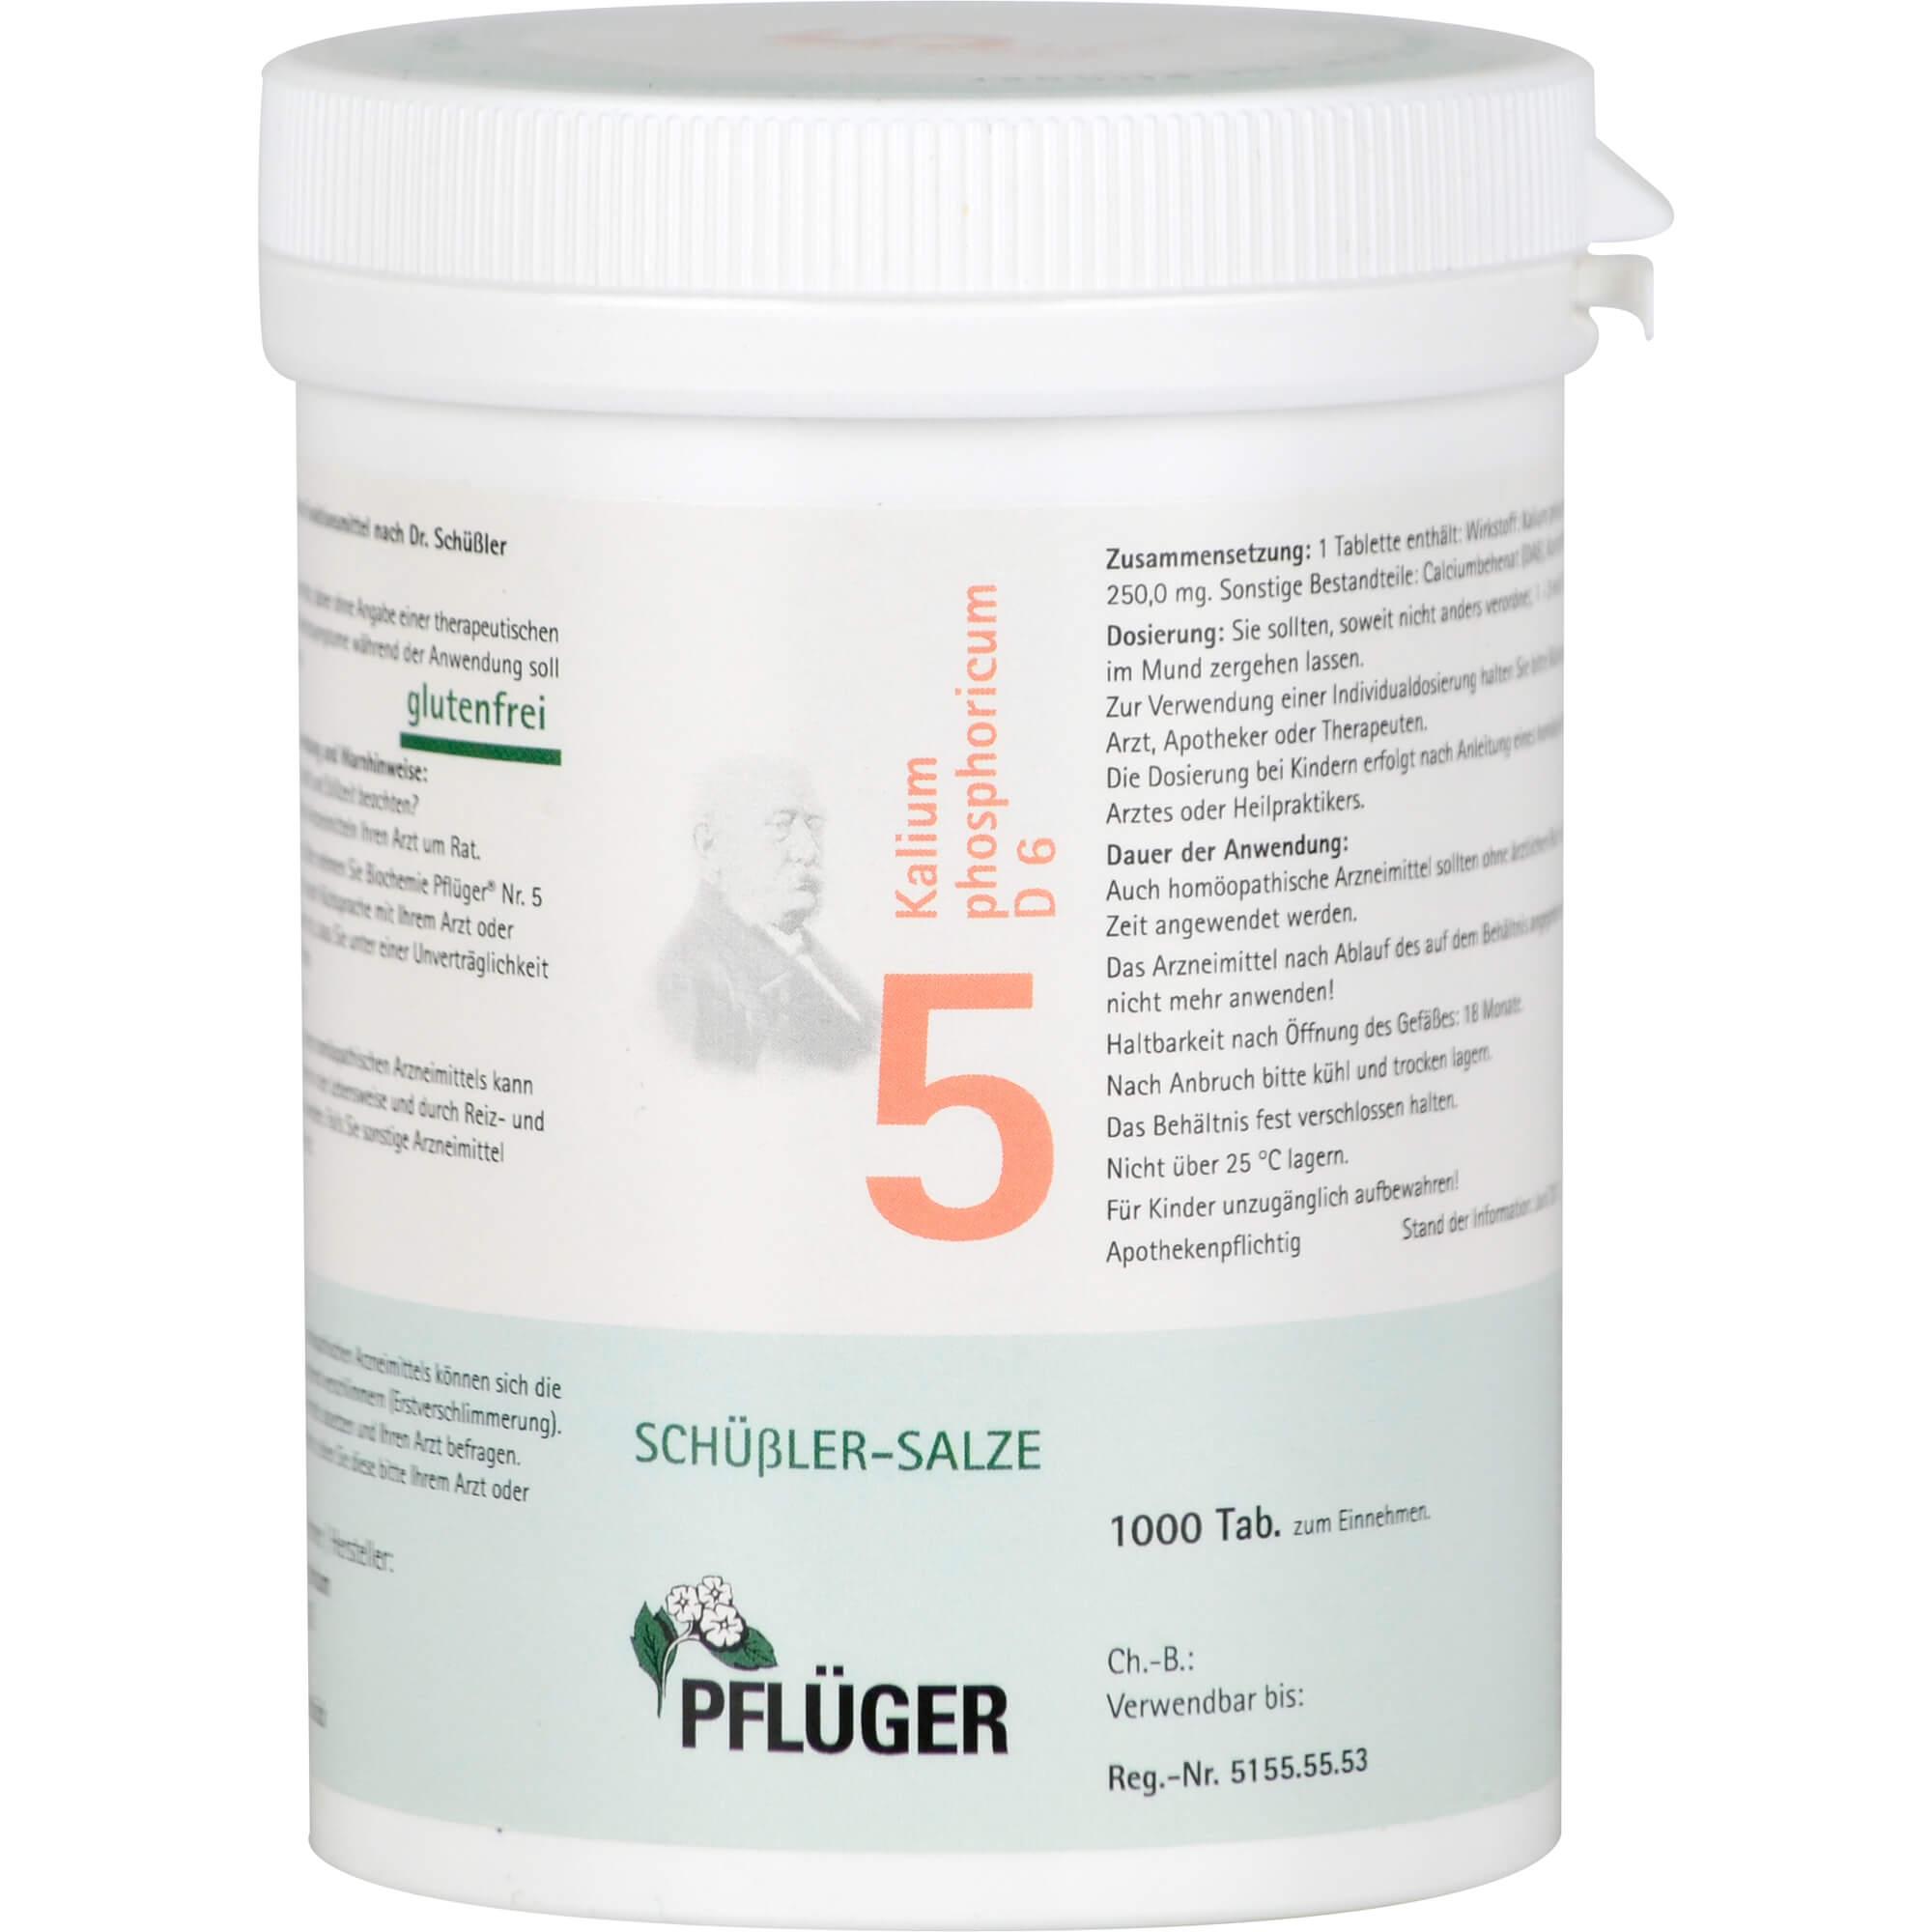 BIOCHEMIE Pflüger 5 Kalium phosphoricum D 6 Tabl.